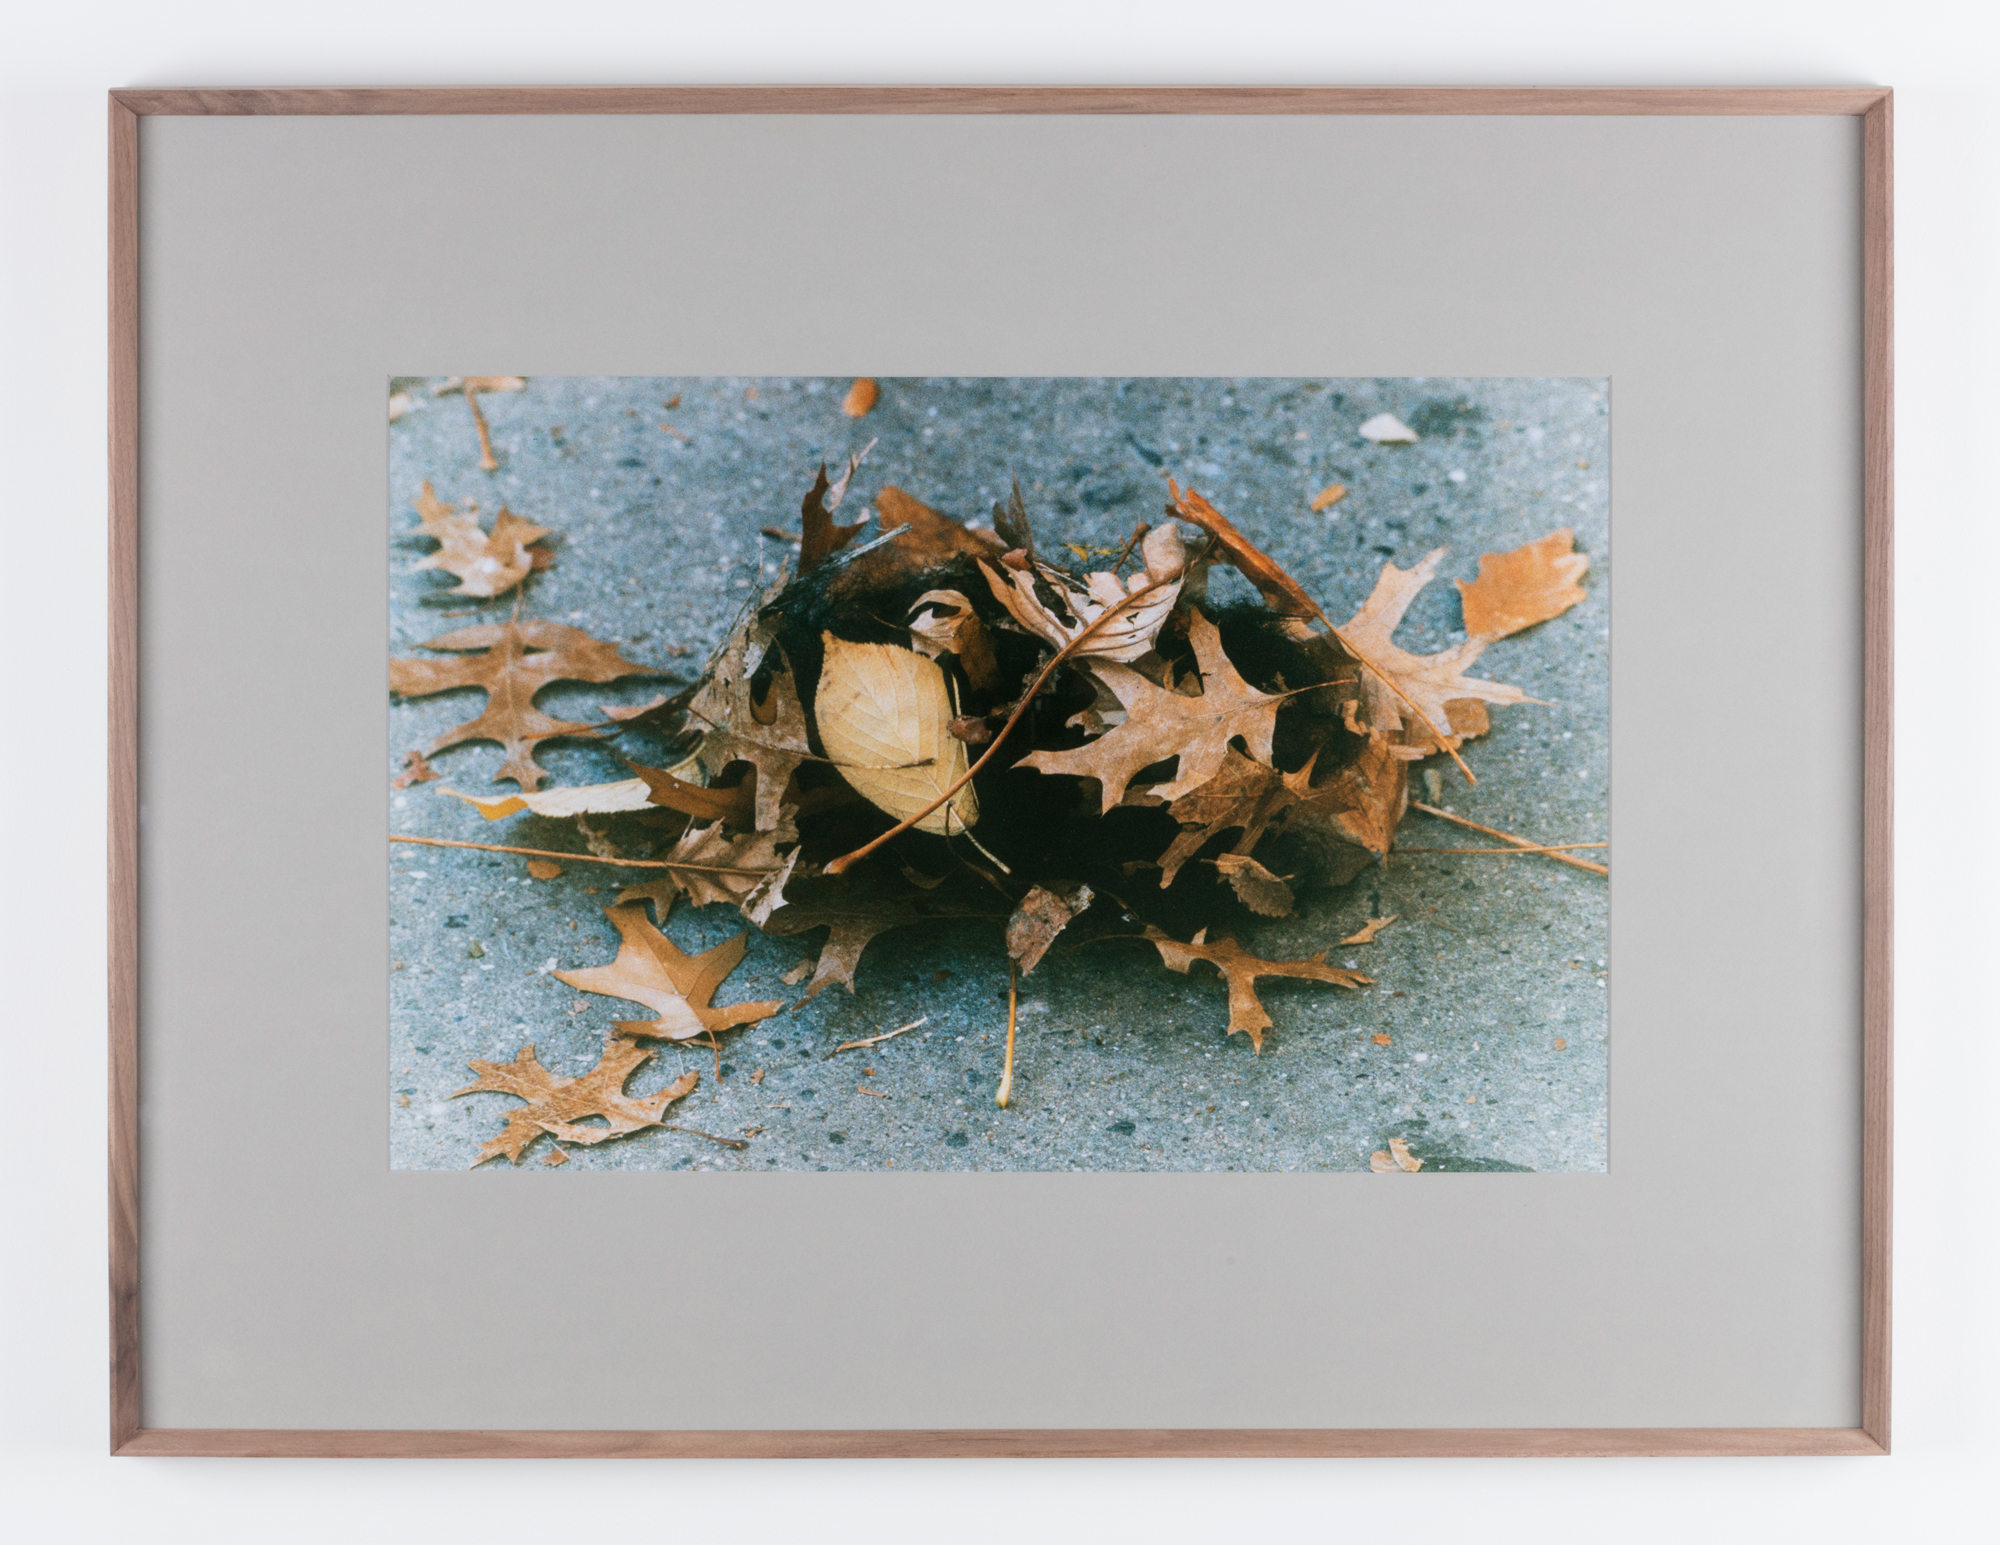 1.Oto_Gillen_Tomorrow_Leaves-2000